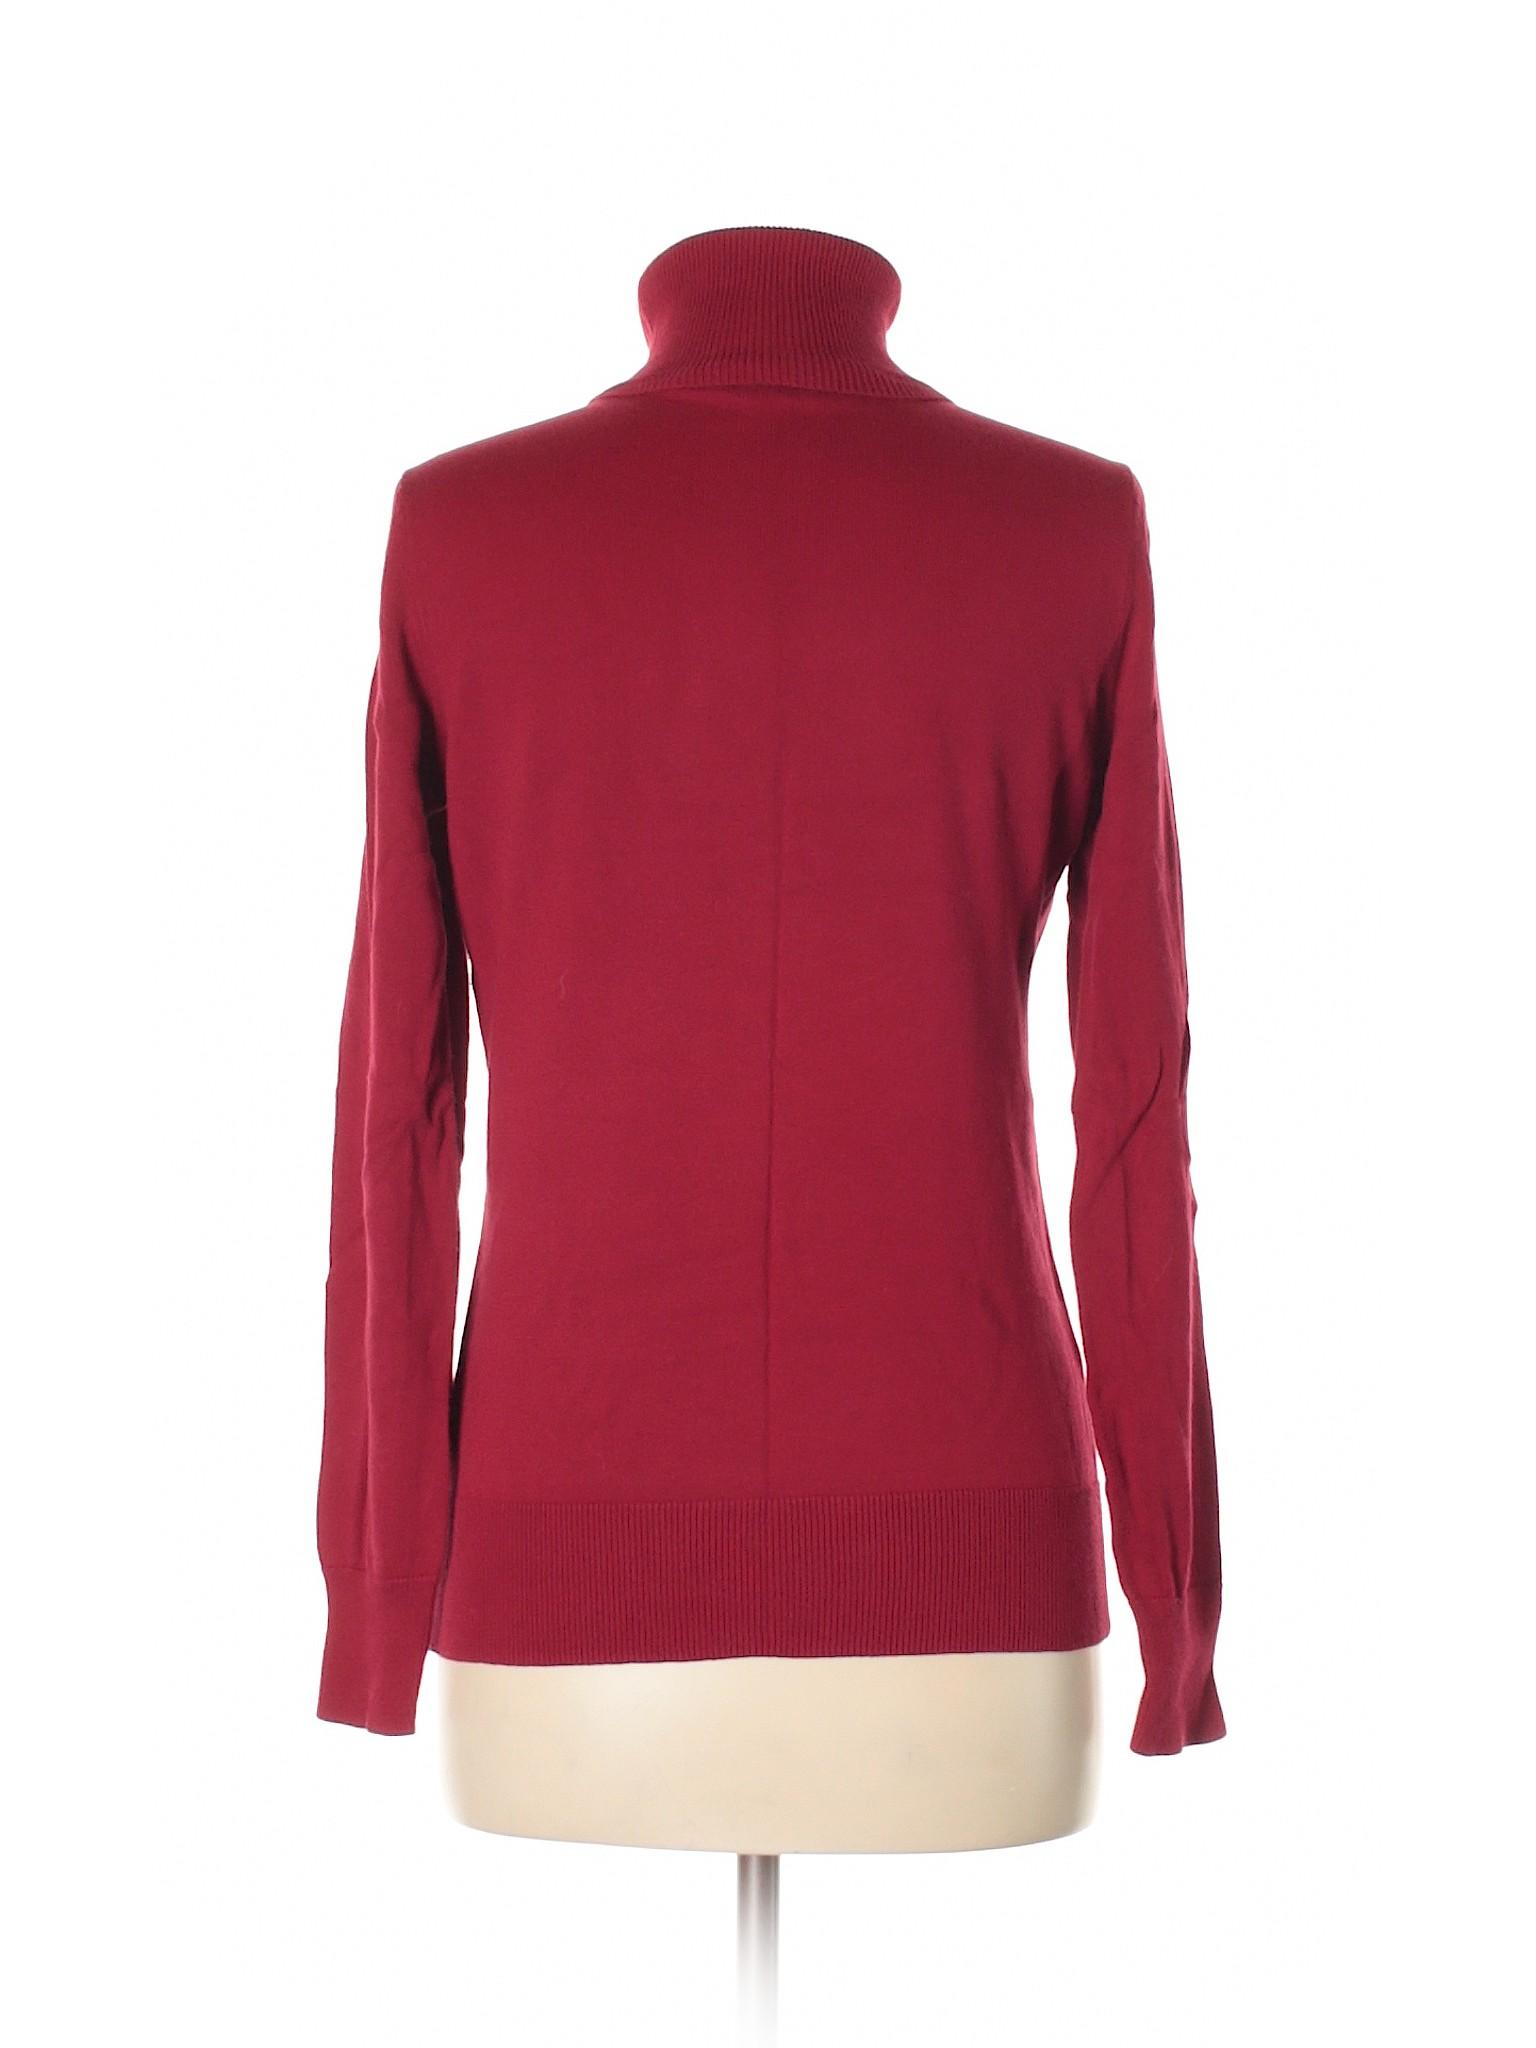 Talbots Boutique winter winter Boutique Sweater Pullover Z0xqB